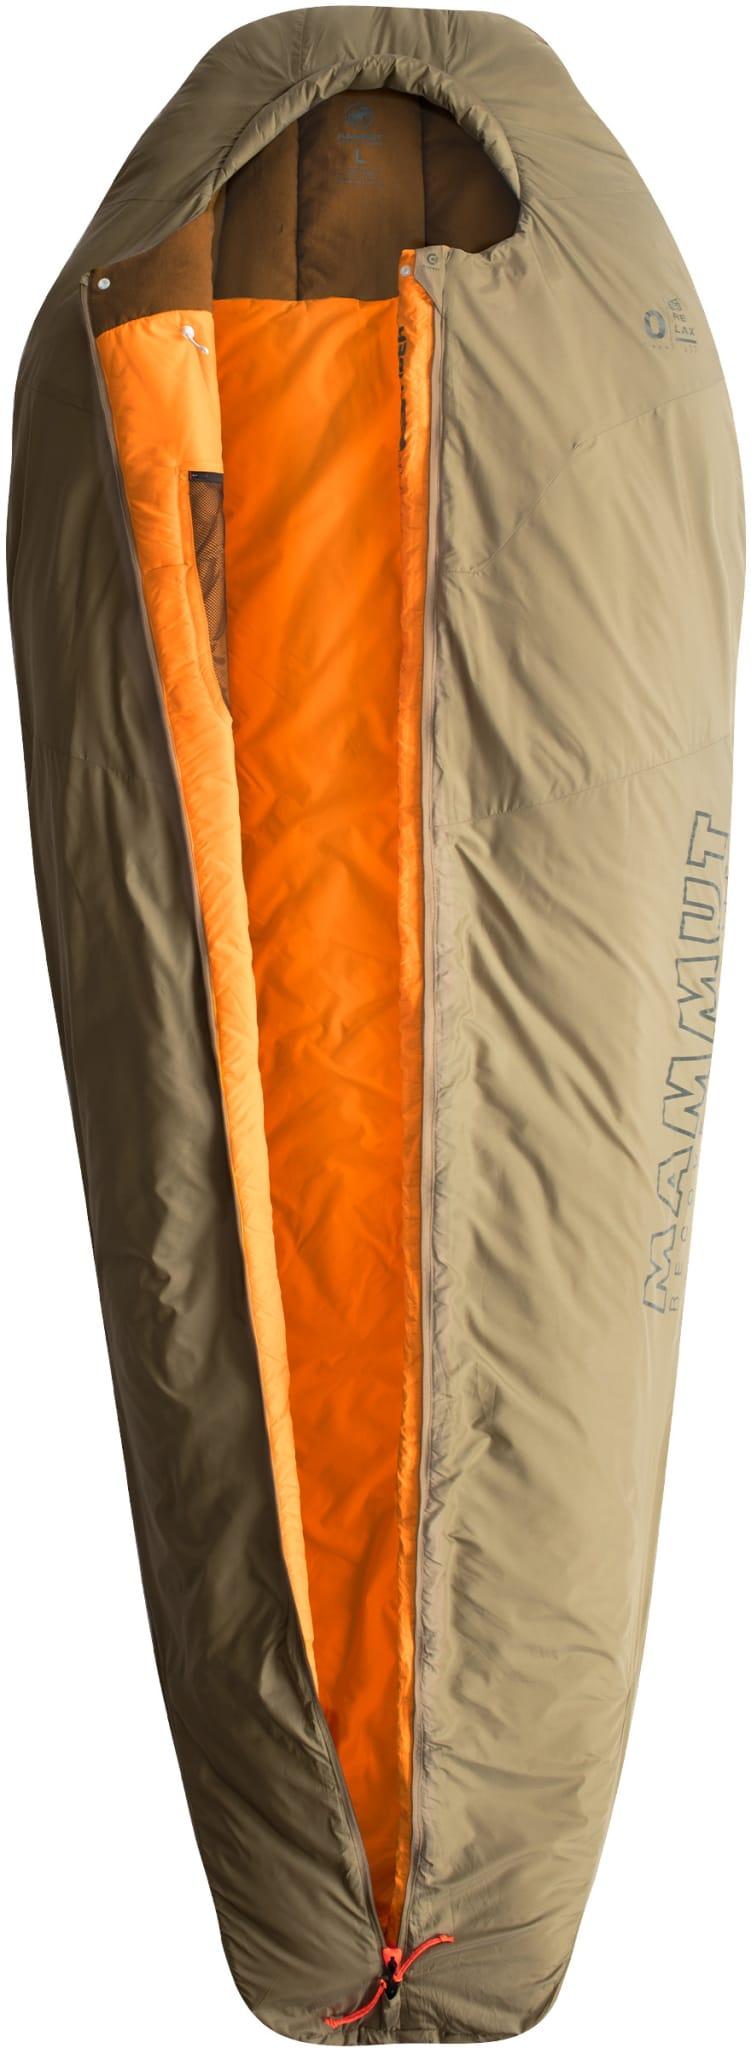 Allround sovepose til sommerens teltturer